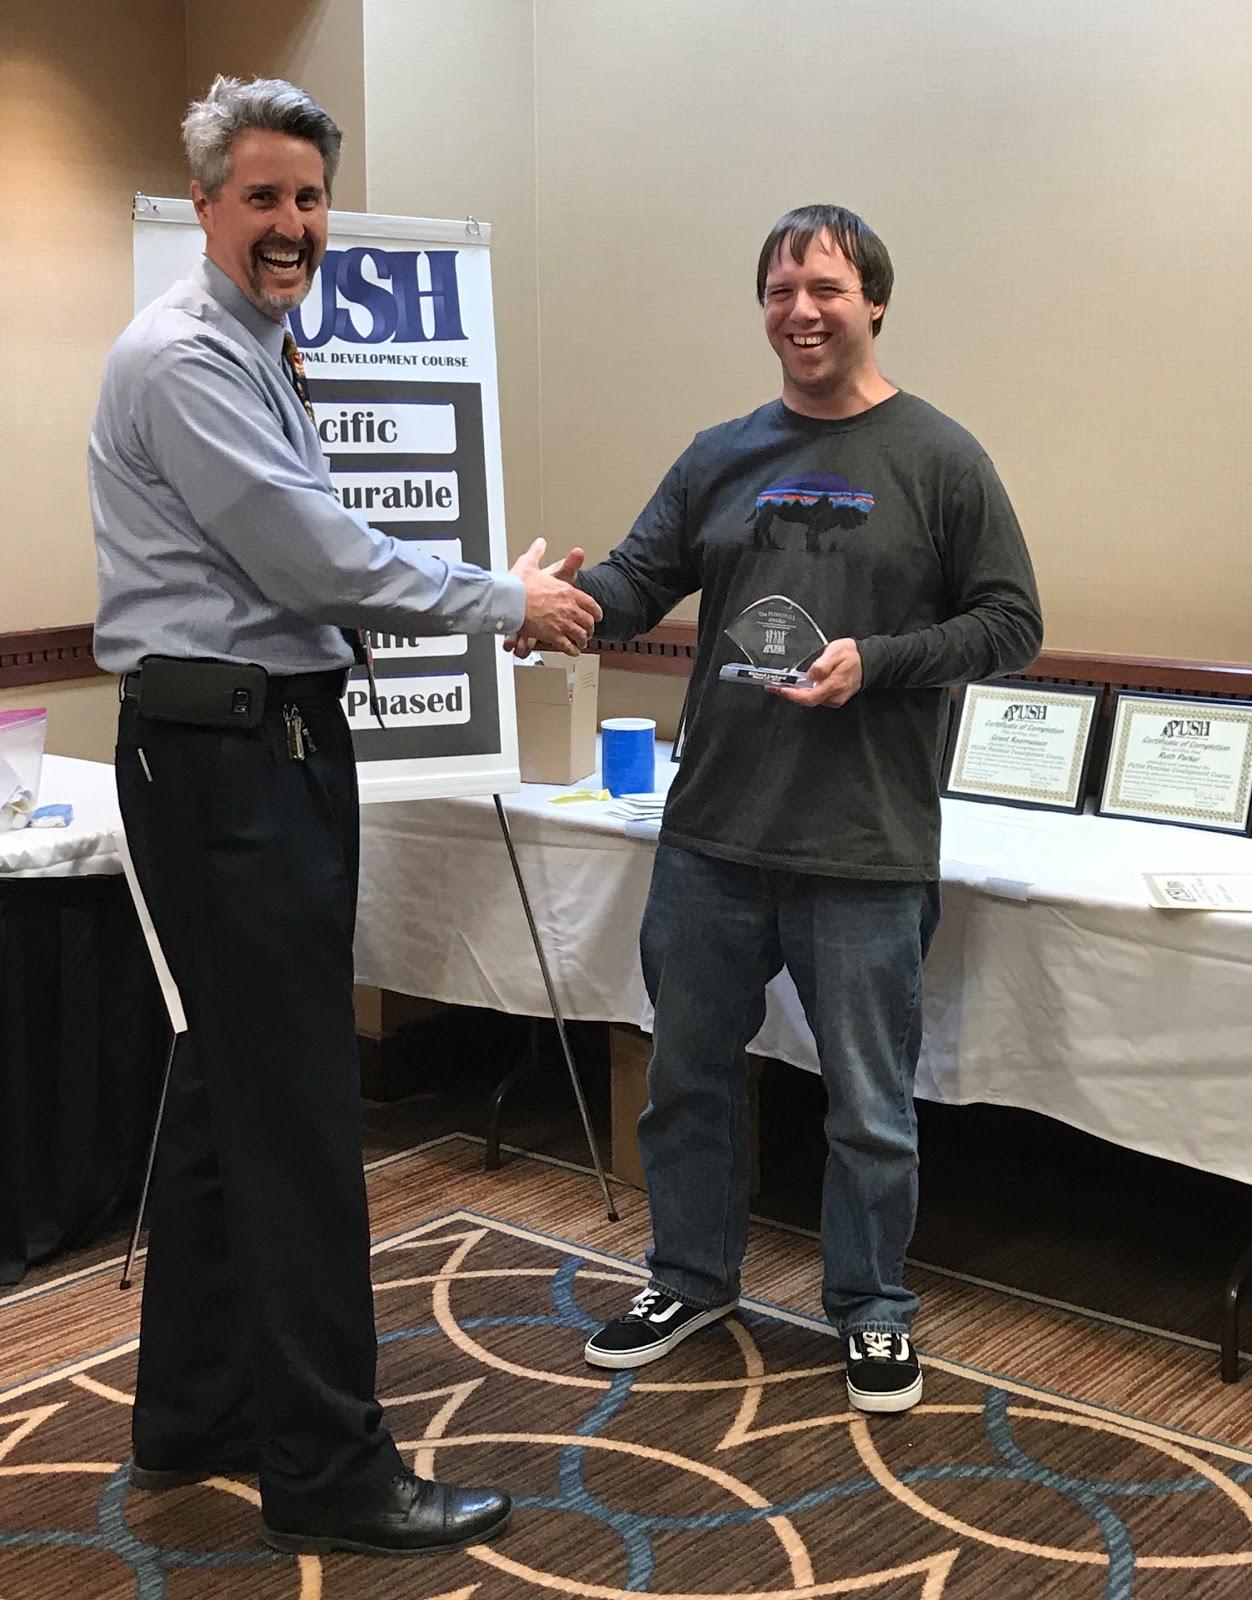 Sioux Falls Awards at Session 12 3/27/18 Richard Locker